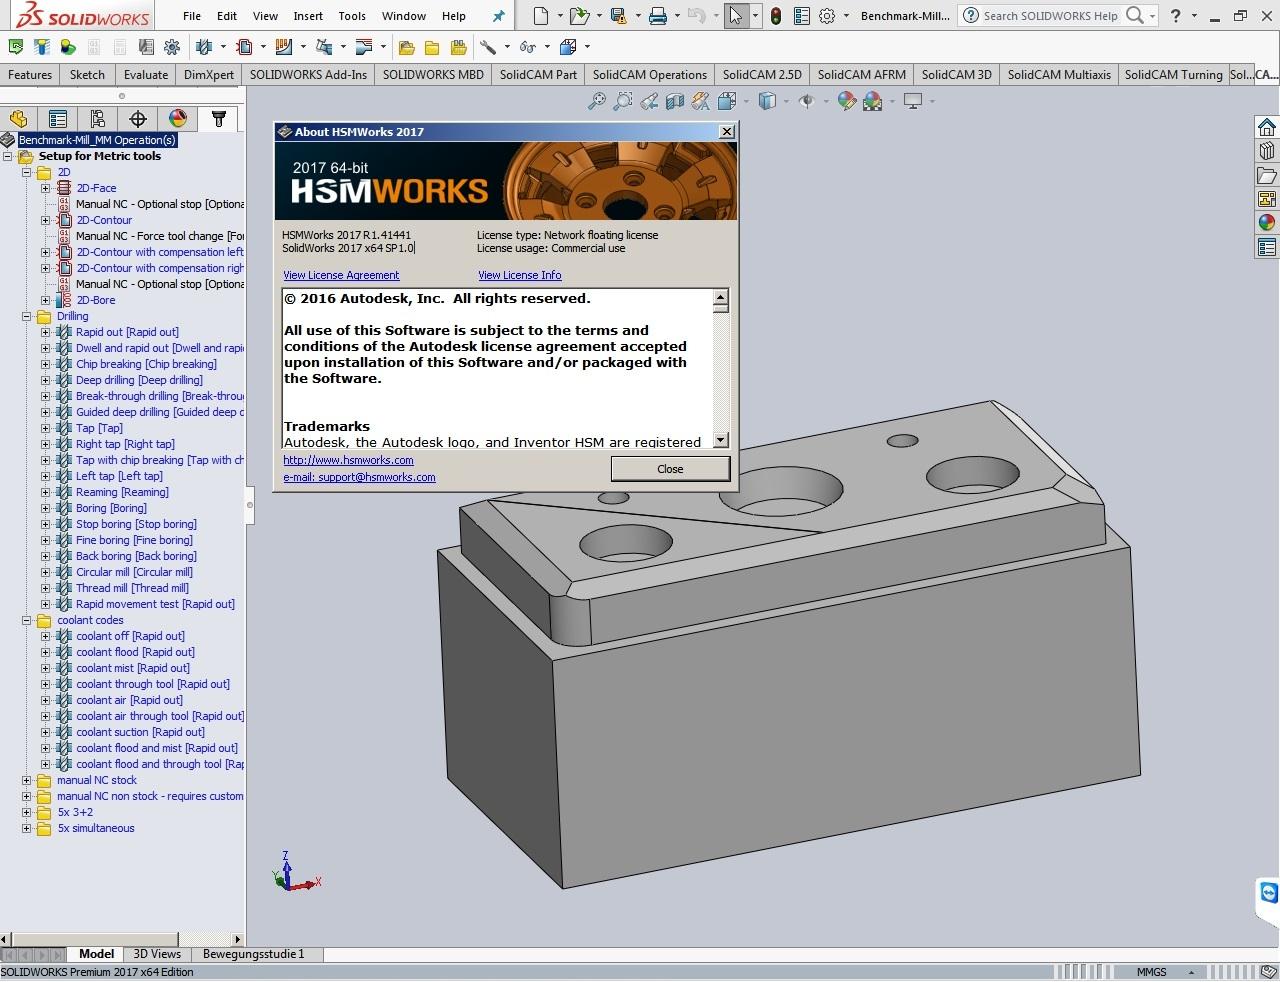 Autodesk HSMWorks 2017 R1.41441 for SolidWorks 2010-2017 full